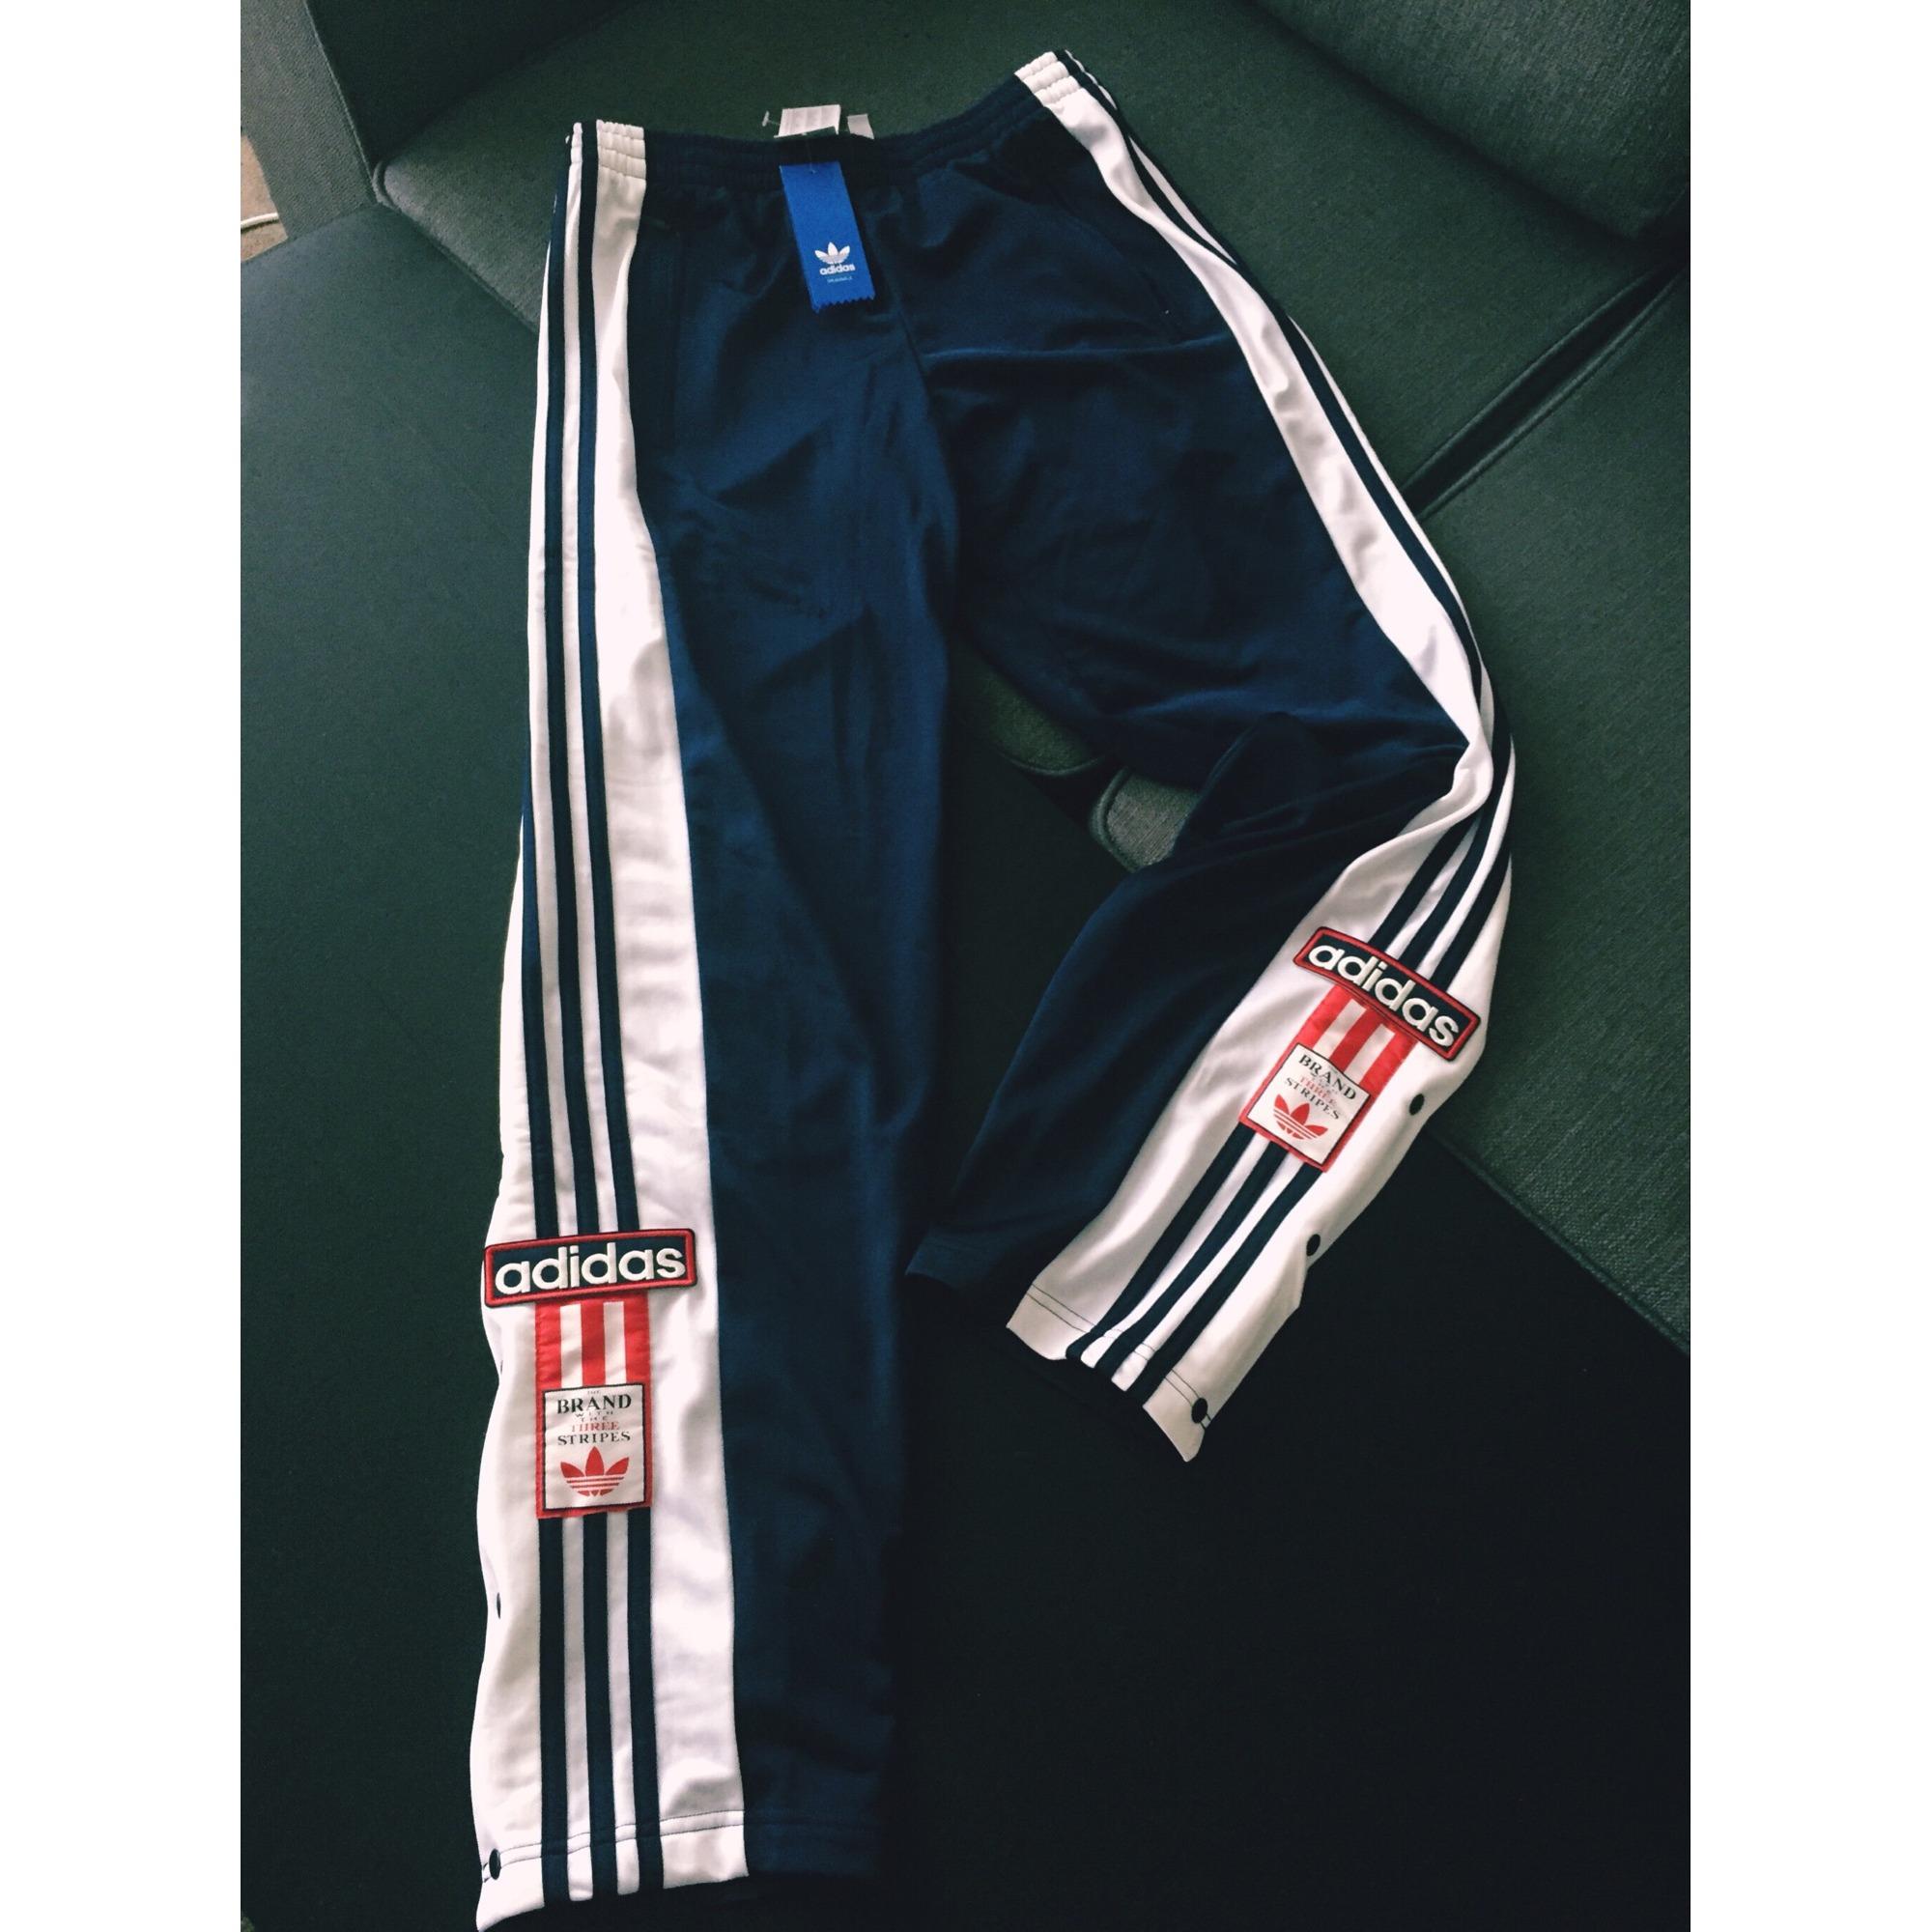 Pantalon de survêtement ADIDAS Bleu, bleu marine, bleu turquoise